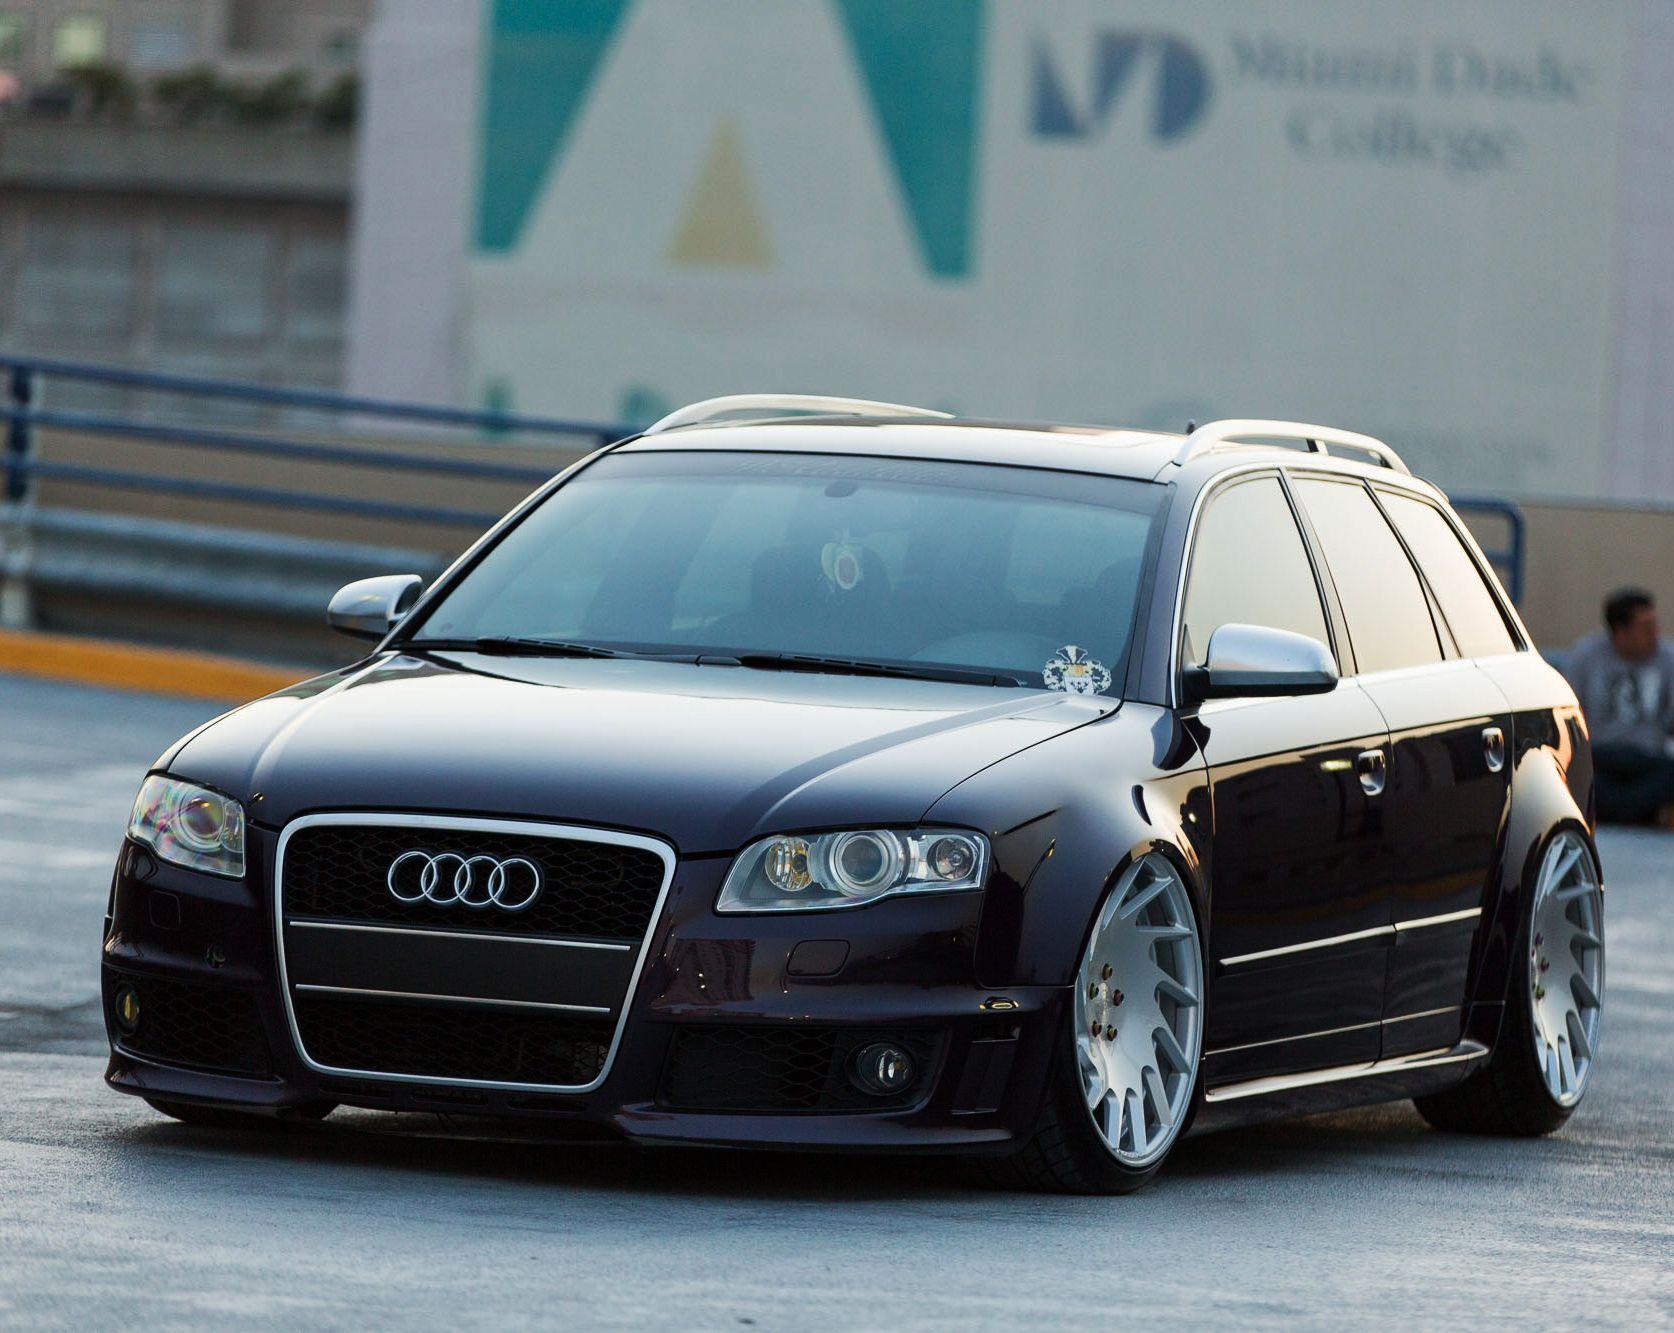 Audi B7 Rs4 Avant Audi Motor A4 Avant Vw Wagon